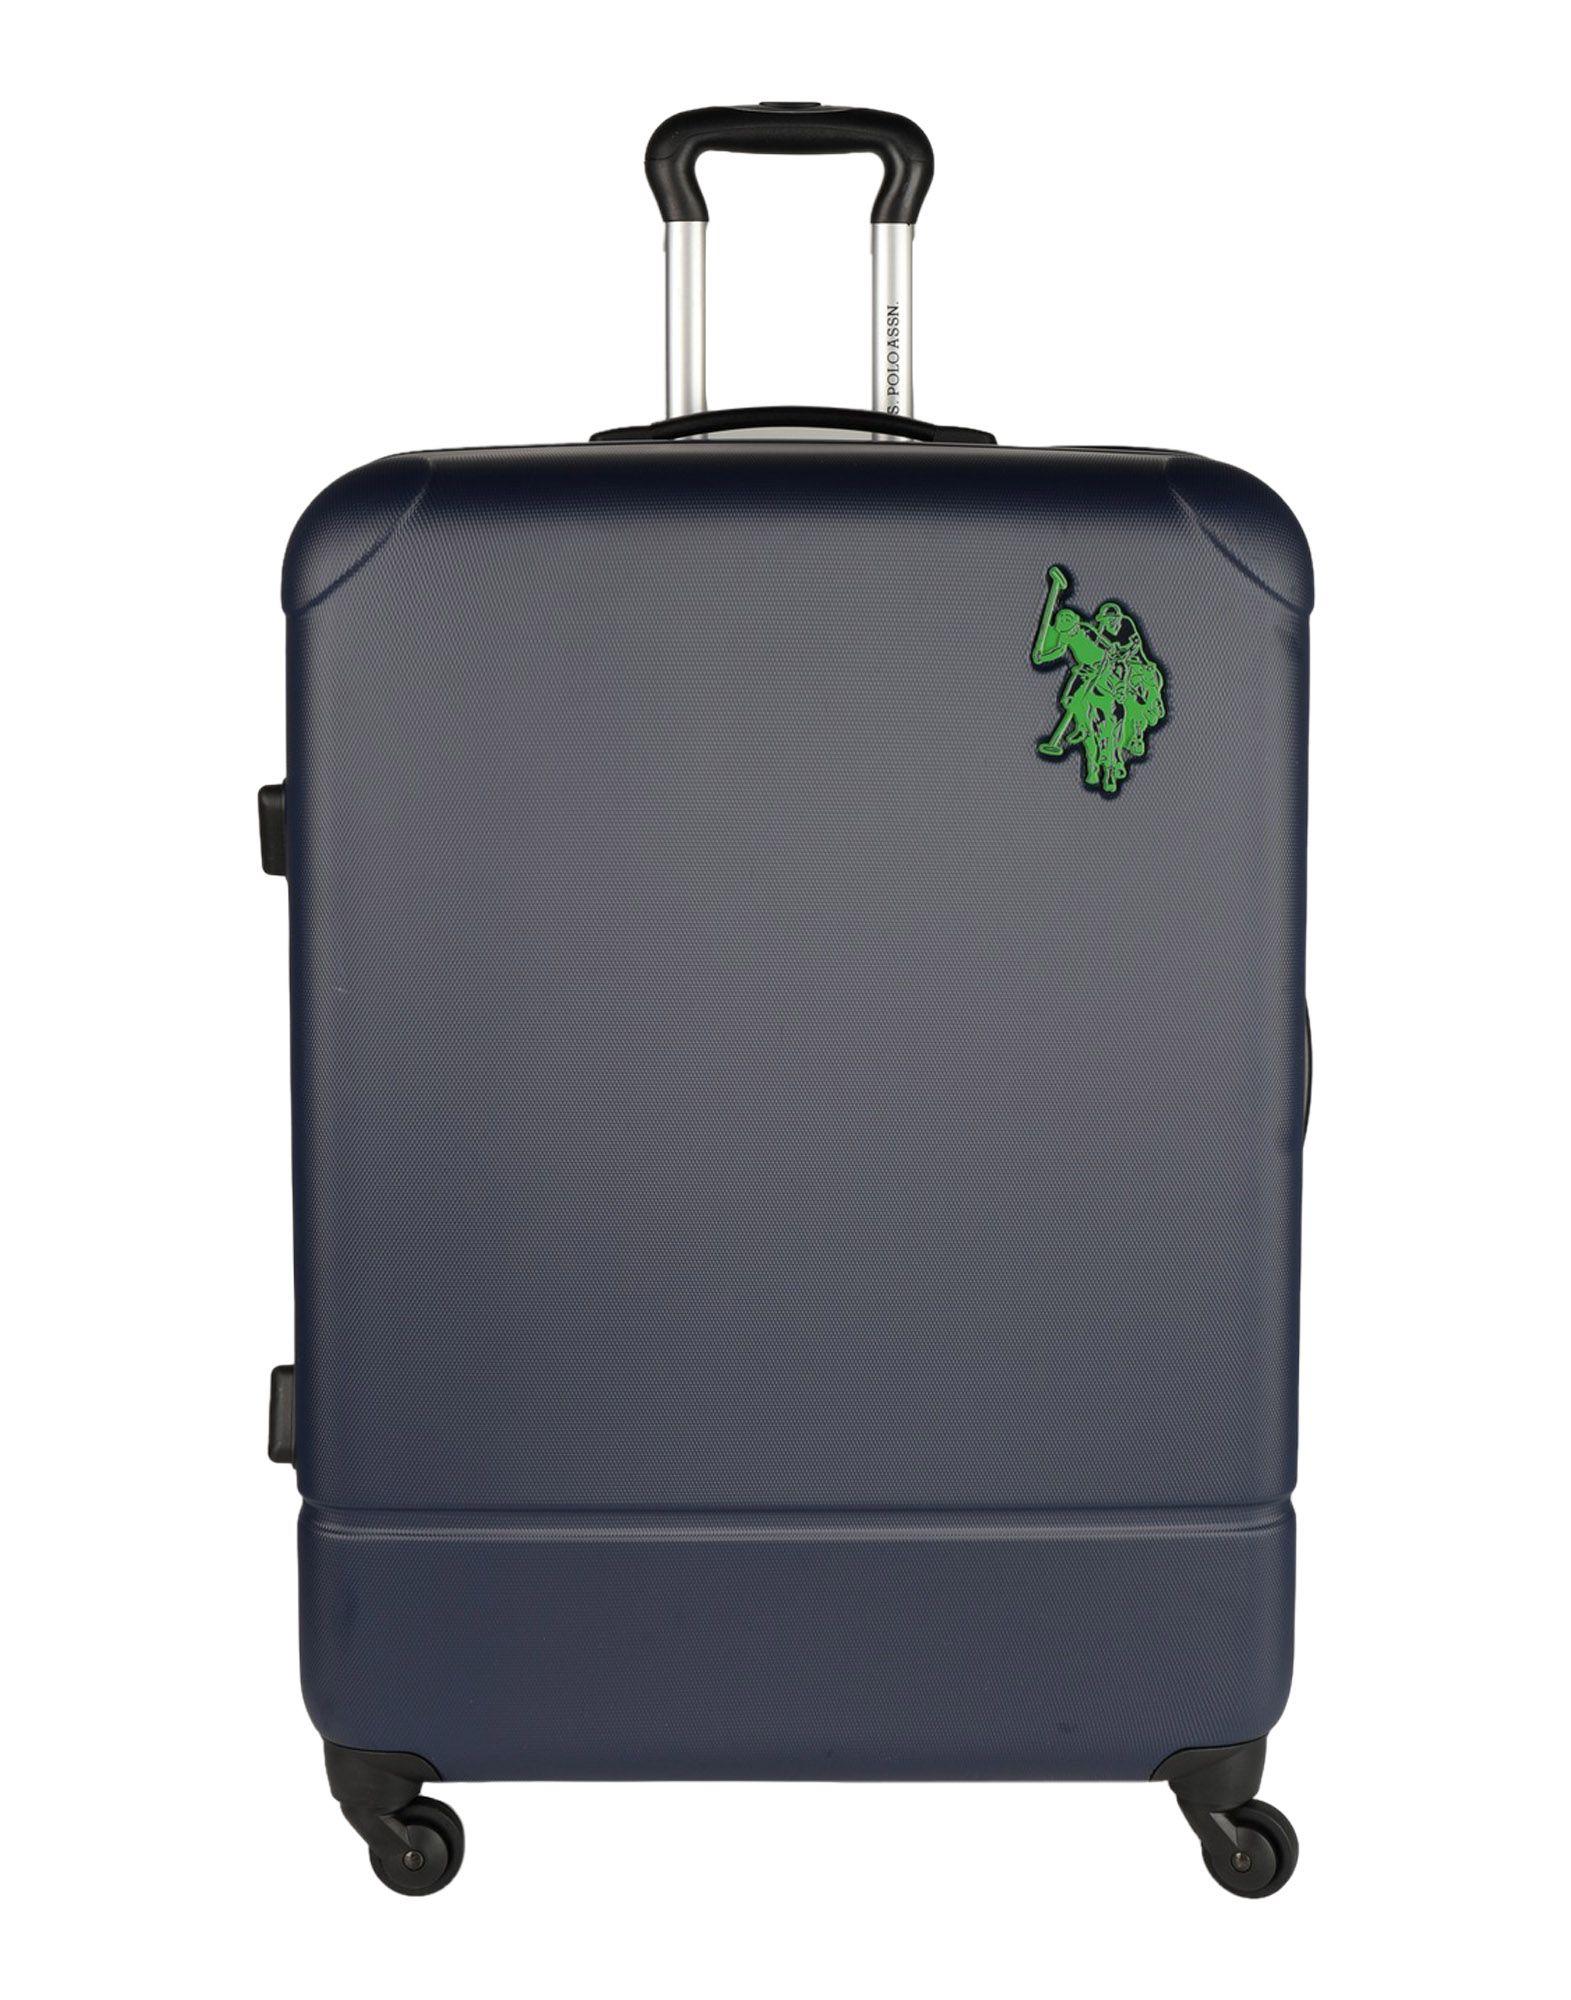 цена U.S.POLO ASSN. Чемодан/сумка на колесиках онлайн в 2017 году